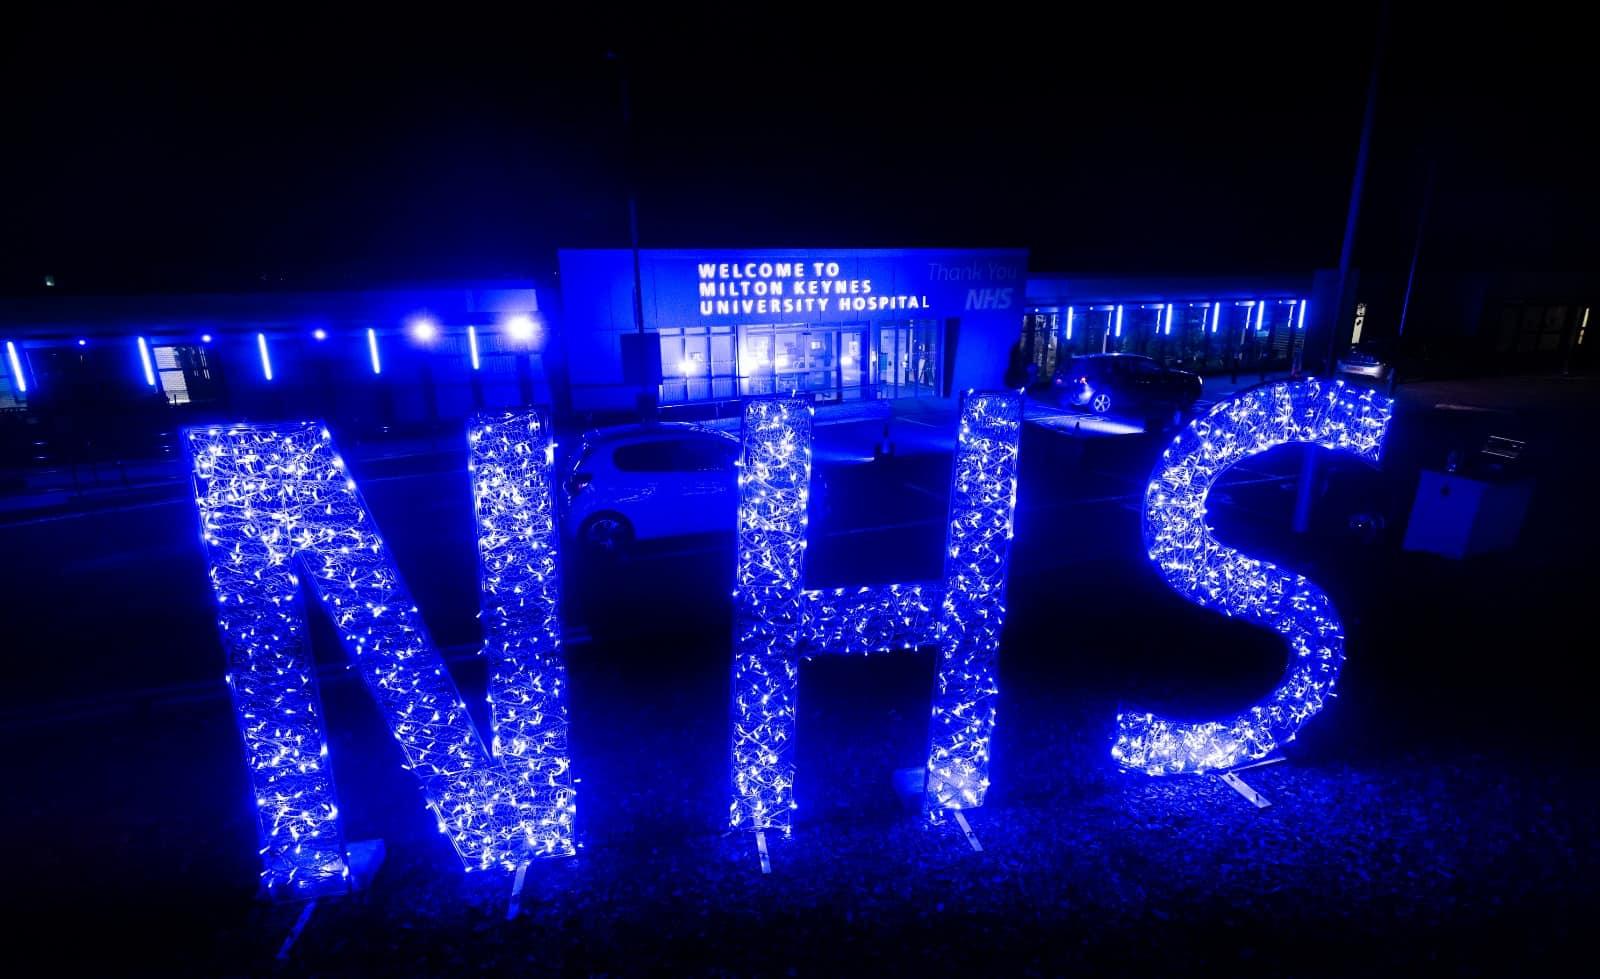 milton keynes university hospital nhs lighting